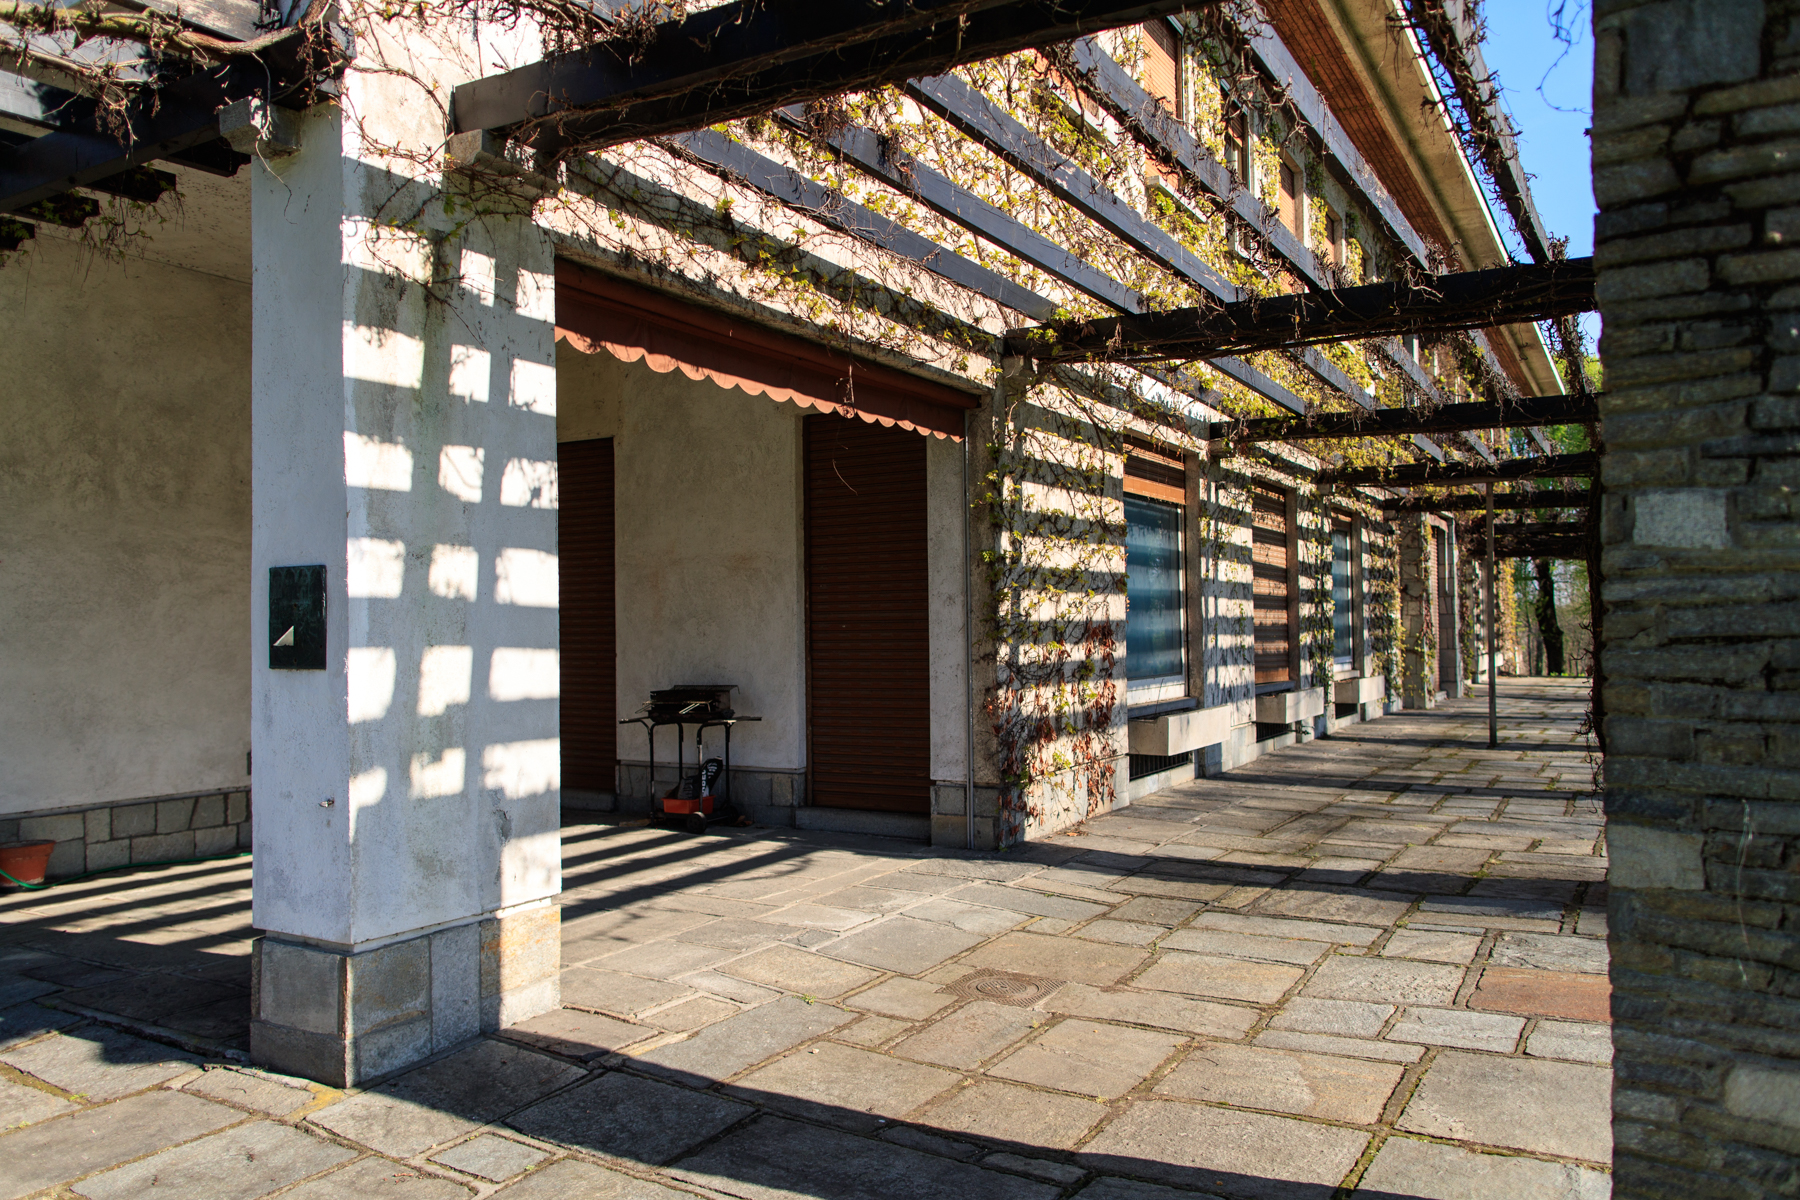 Casa indipendente in Vendita a Venaria: 5 locali, 1000 mq - Foto 4